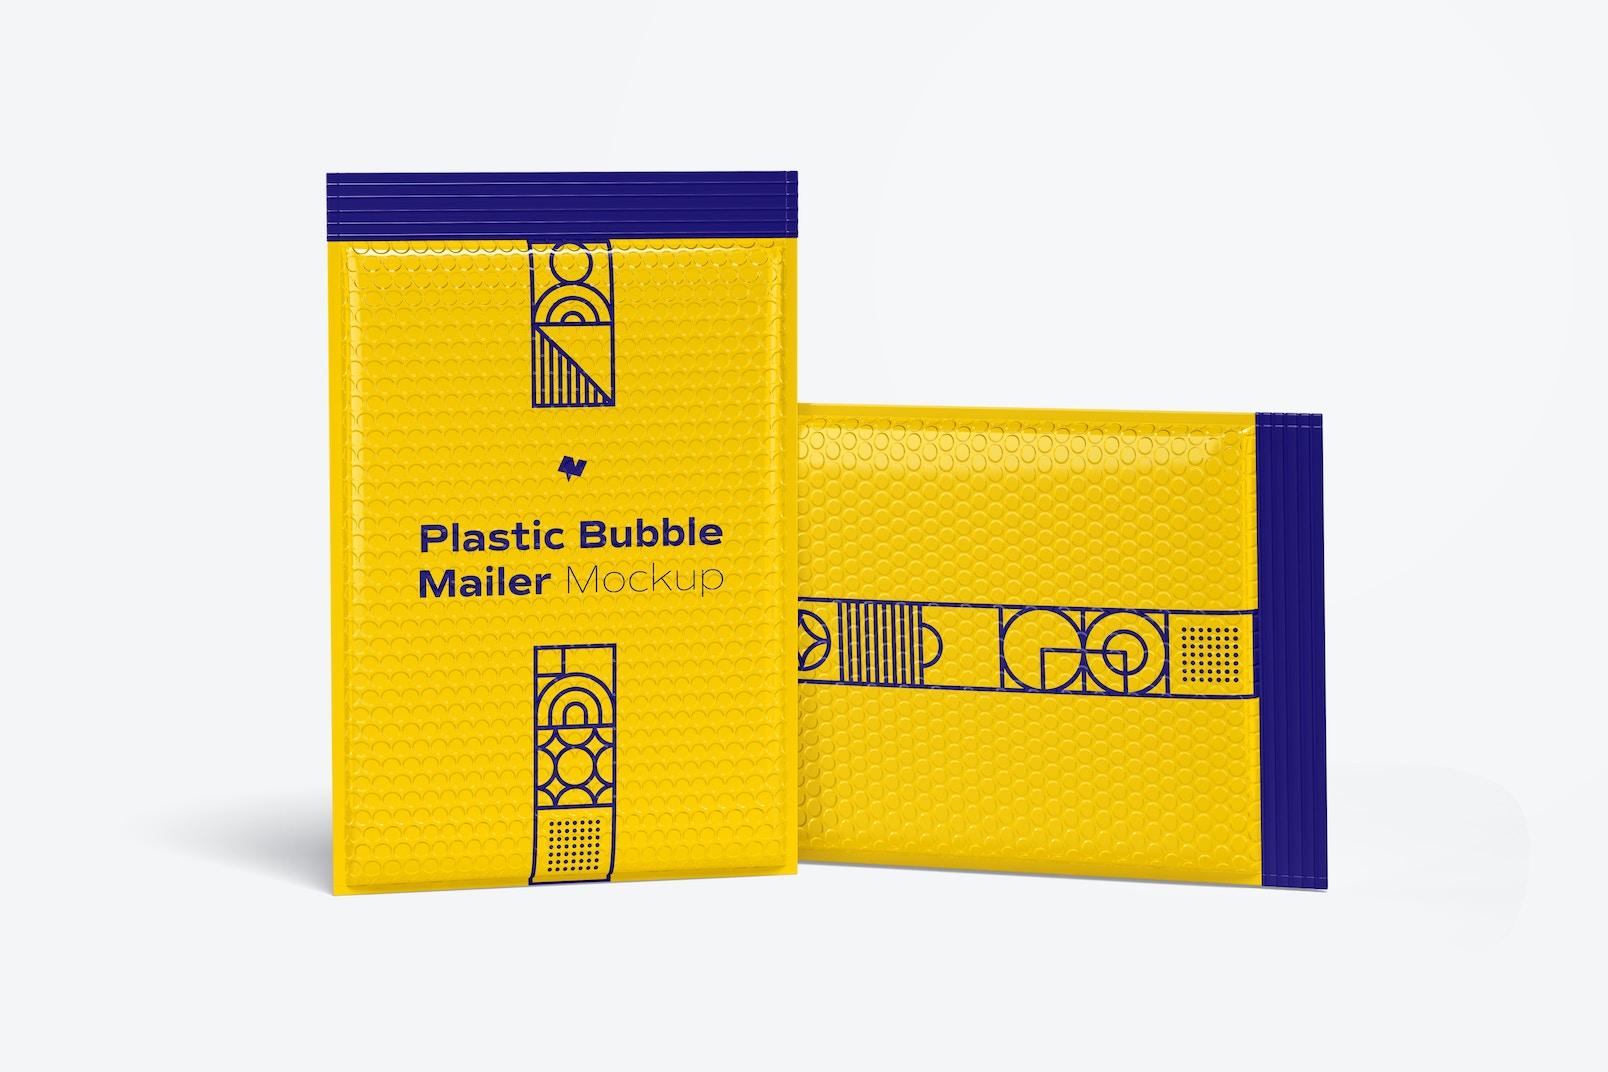 Plastic Bubble Mailers Mockup